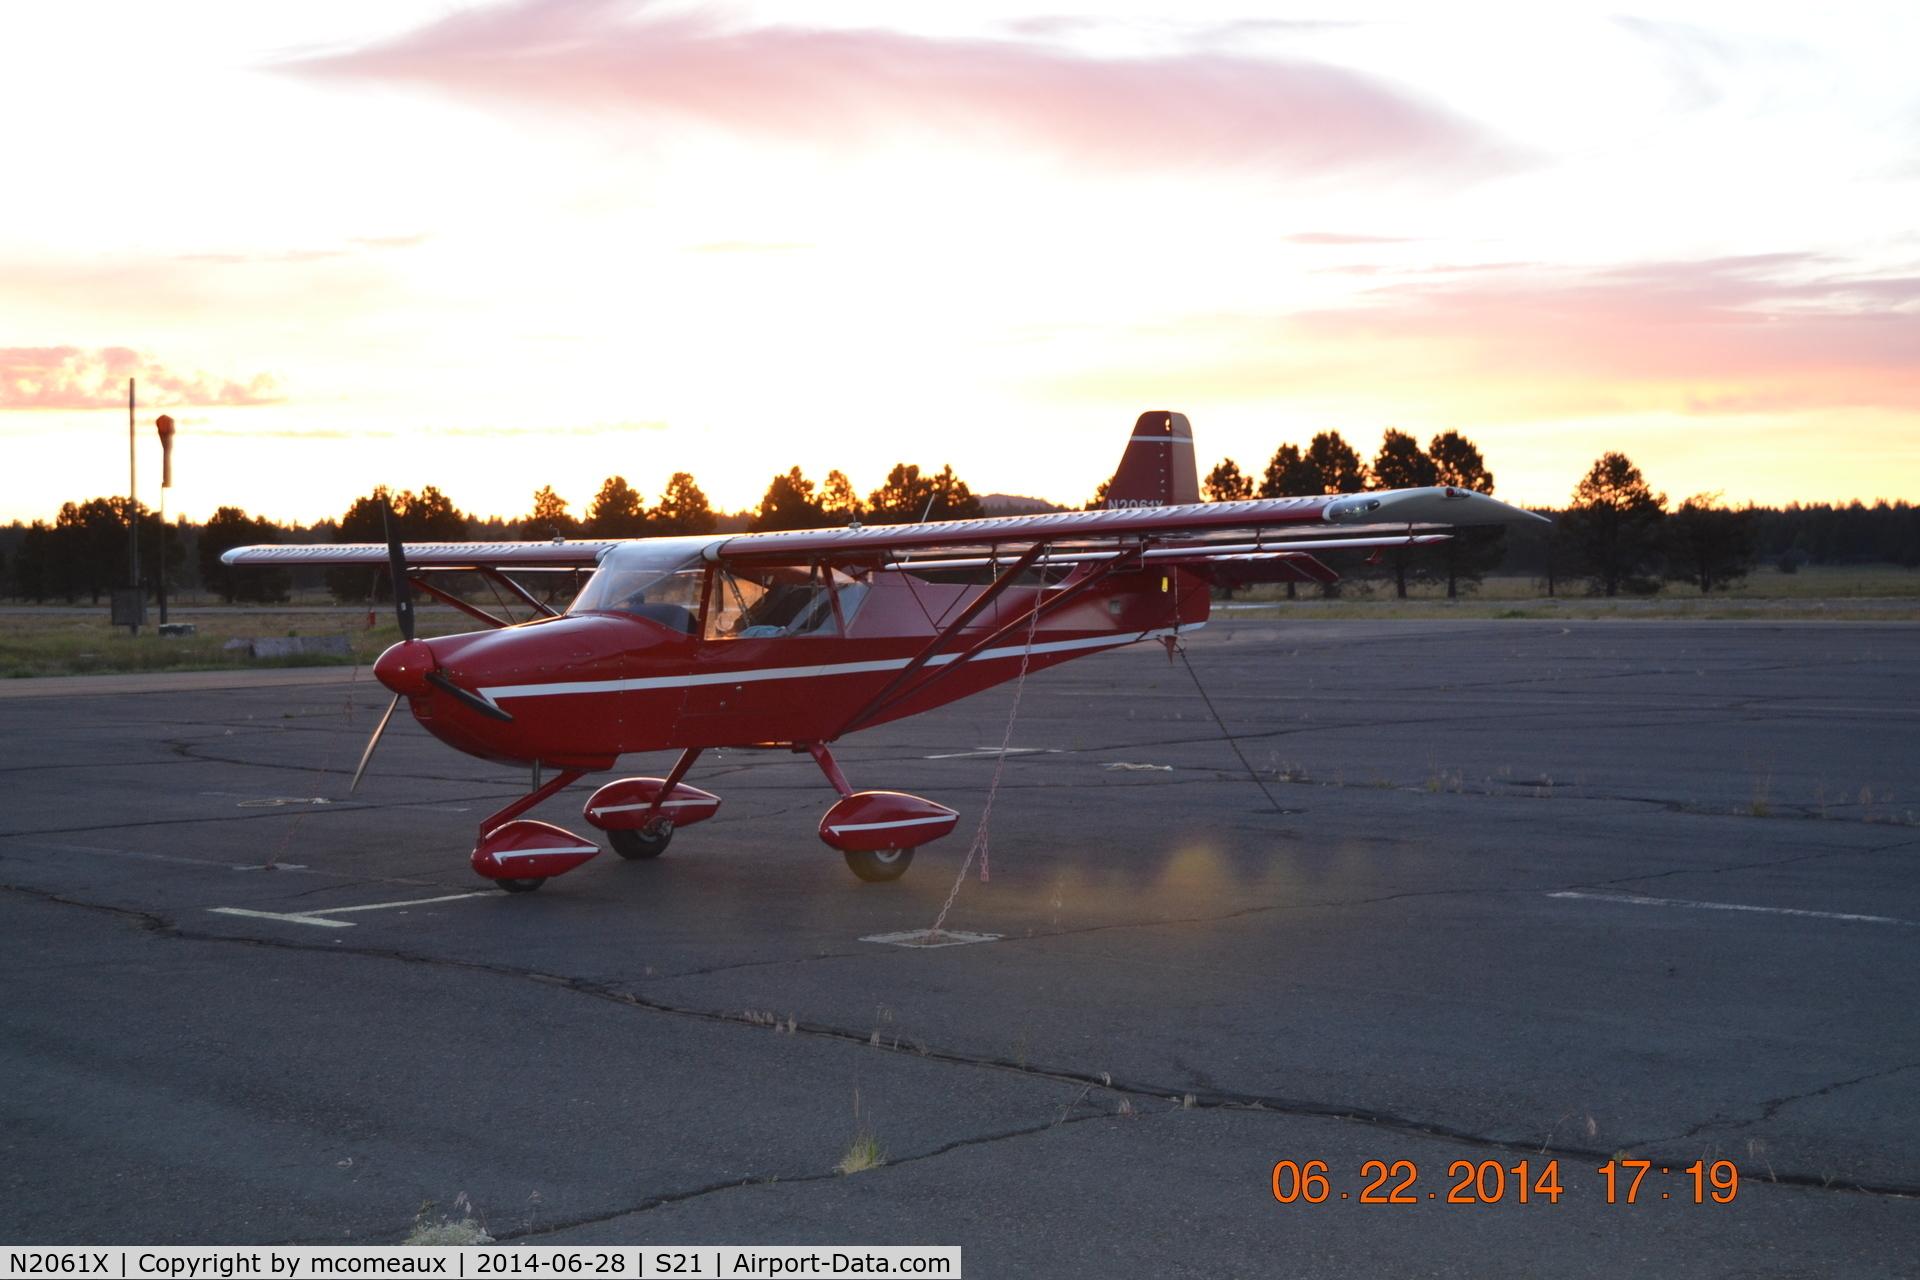 N2061X, 2003 Skystar Kitfox Series 7 C/N F60111-071, 2003 Kitfox 7